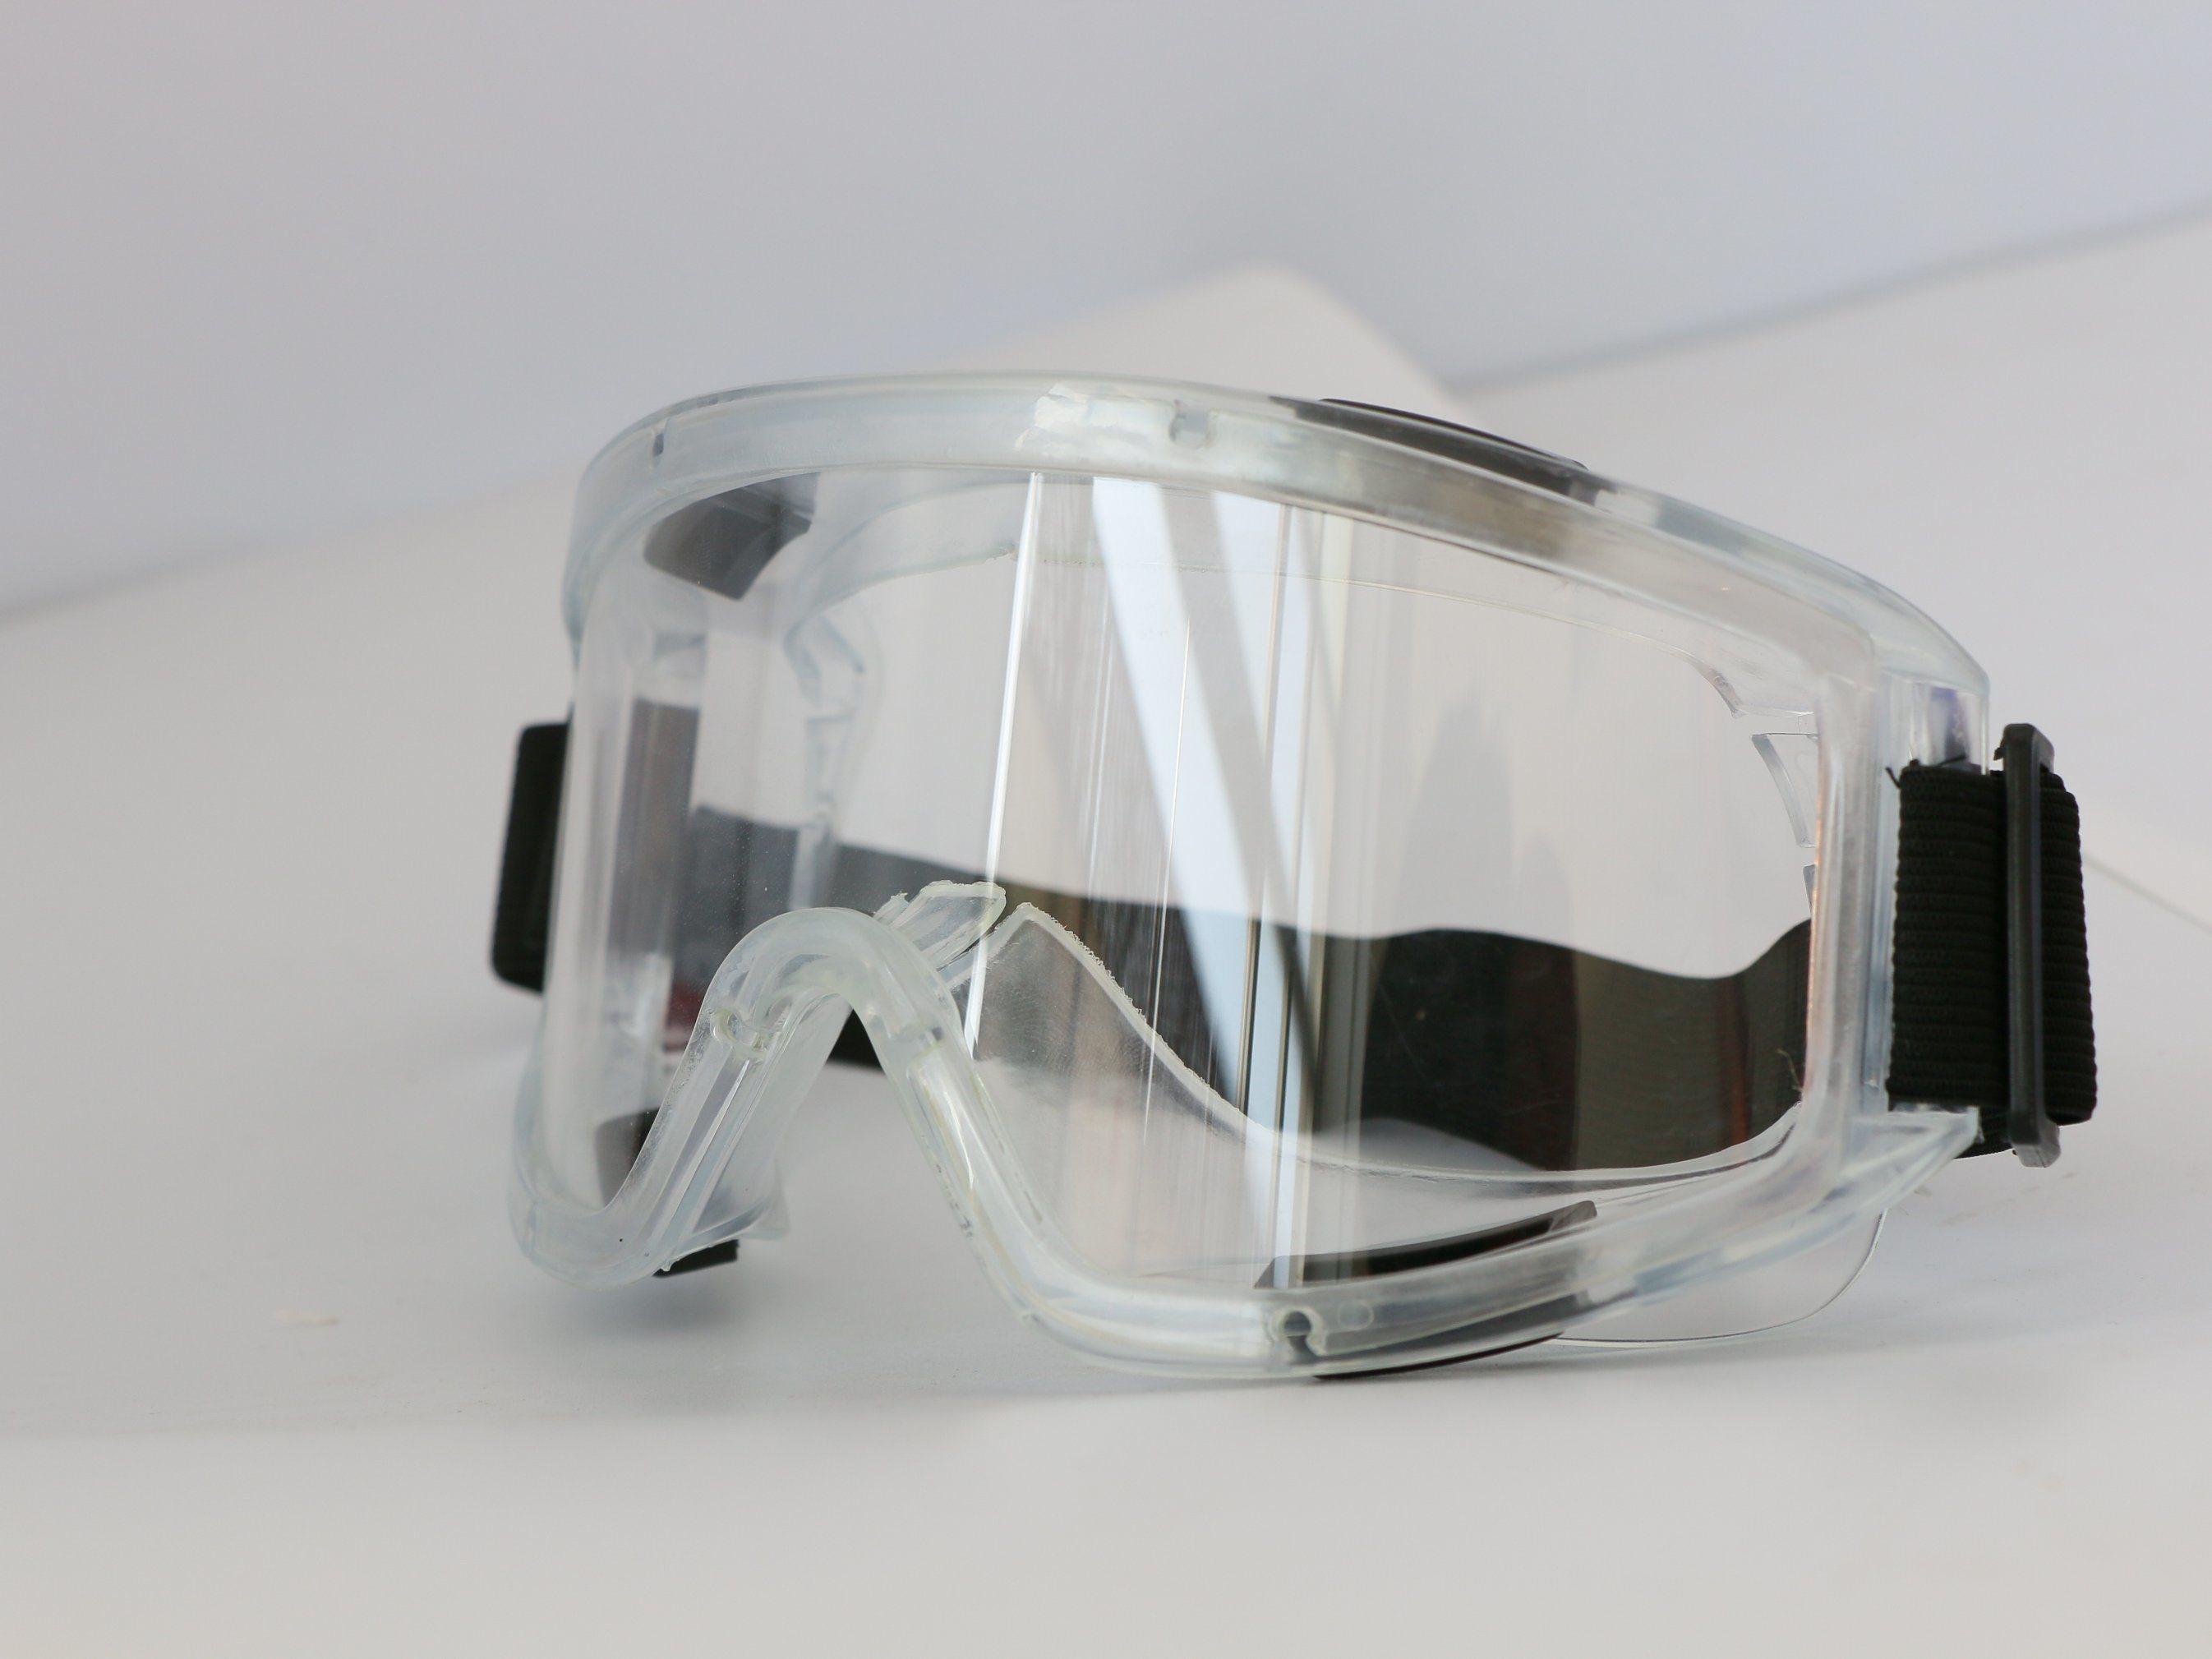 Veiligheidsbril Bouw Werkplekogen Veiligheidsbrillen bril